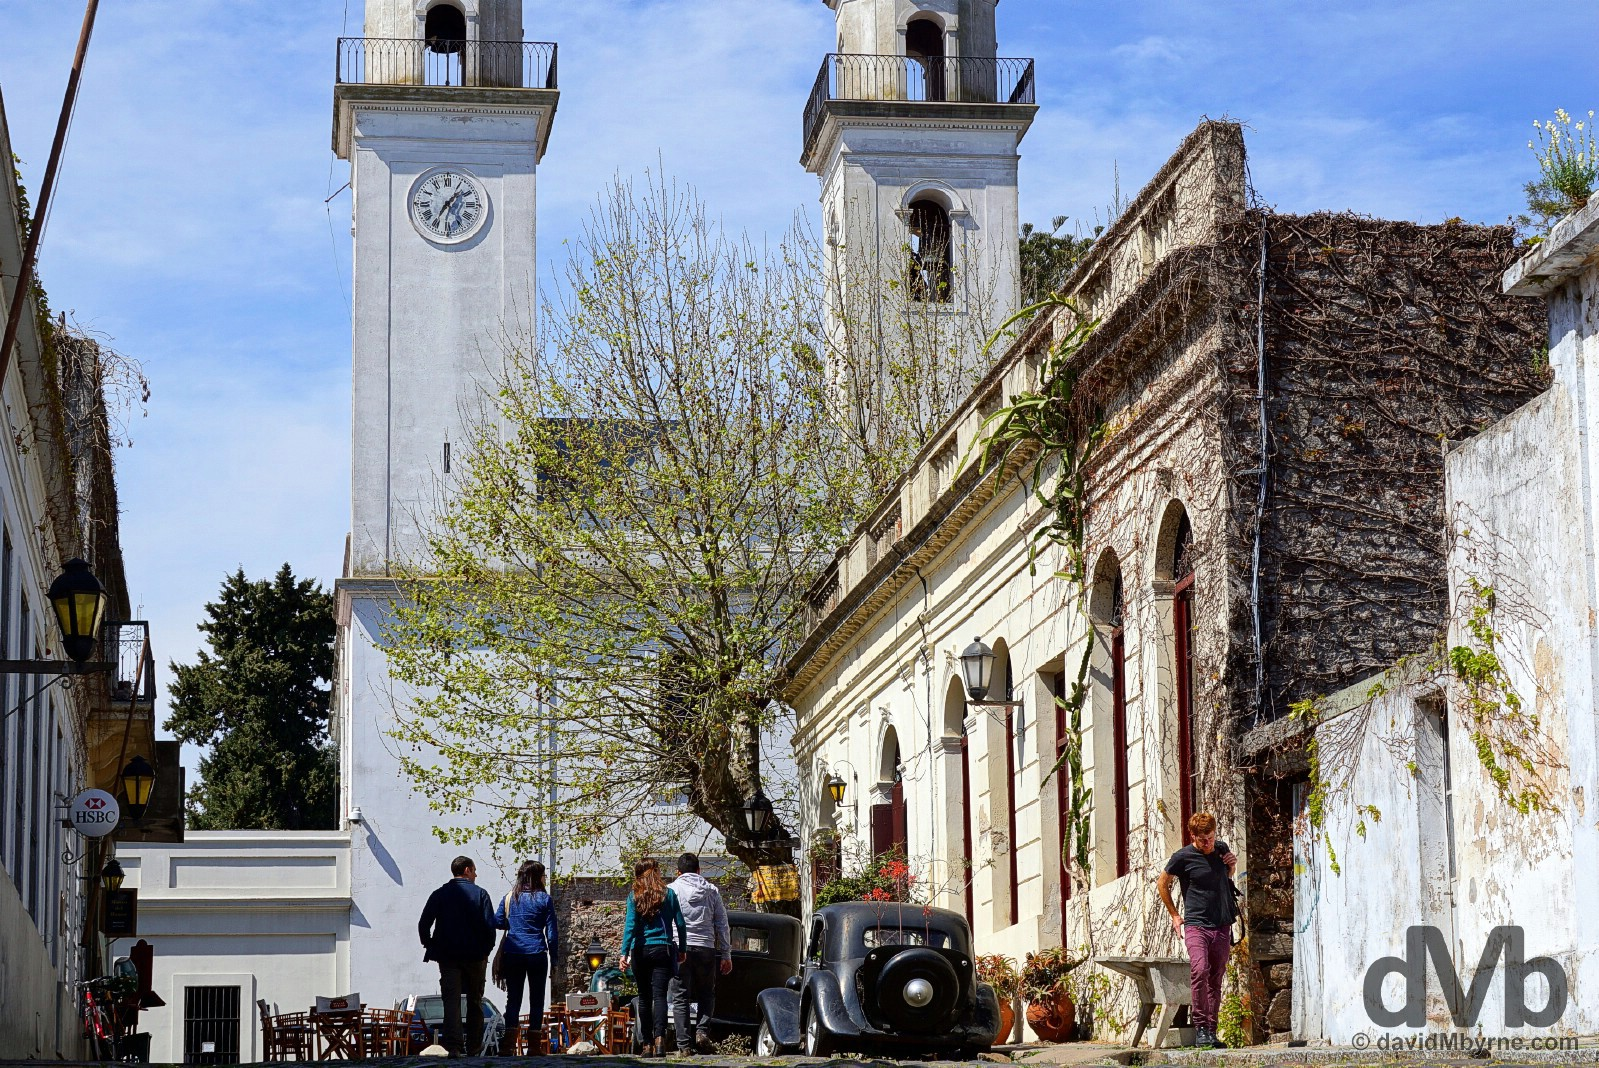 De Portugal, Colonia del Sacramento, Uruguay. September 20, 2015.